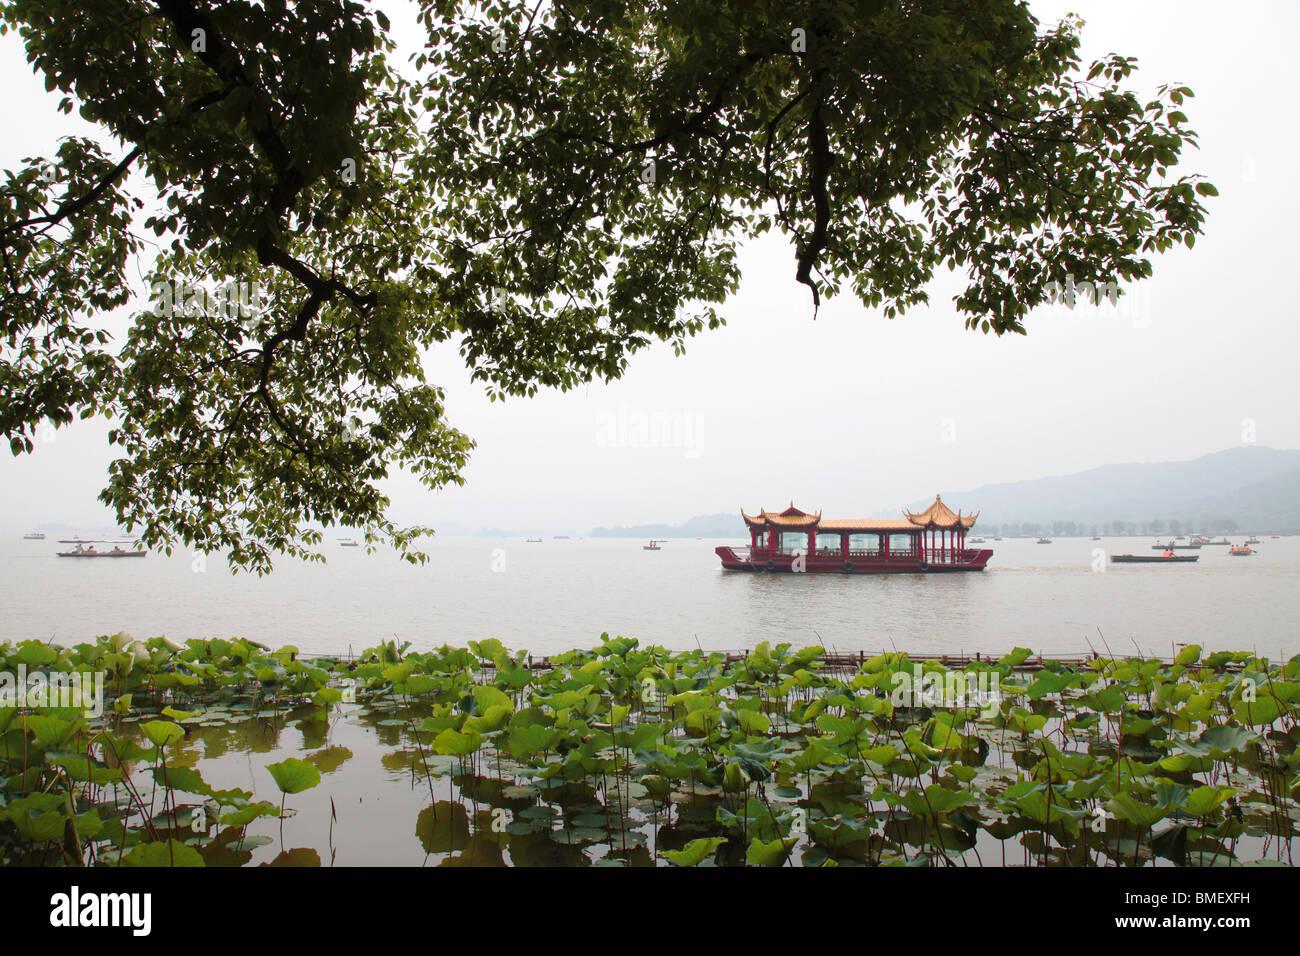 Tour boat on West Lake, Hangzhou City, Zhejiang Province, China - Stock Image